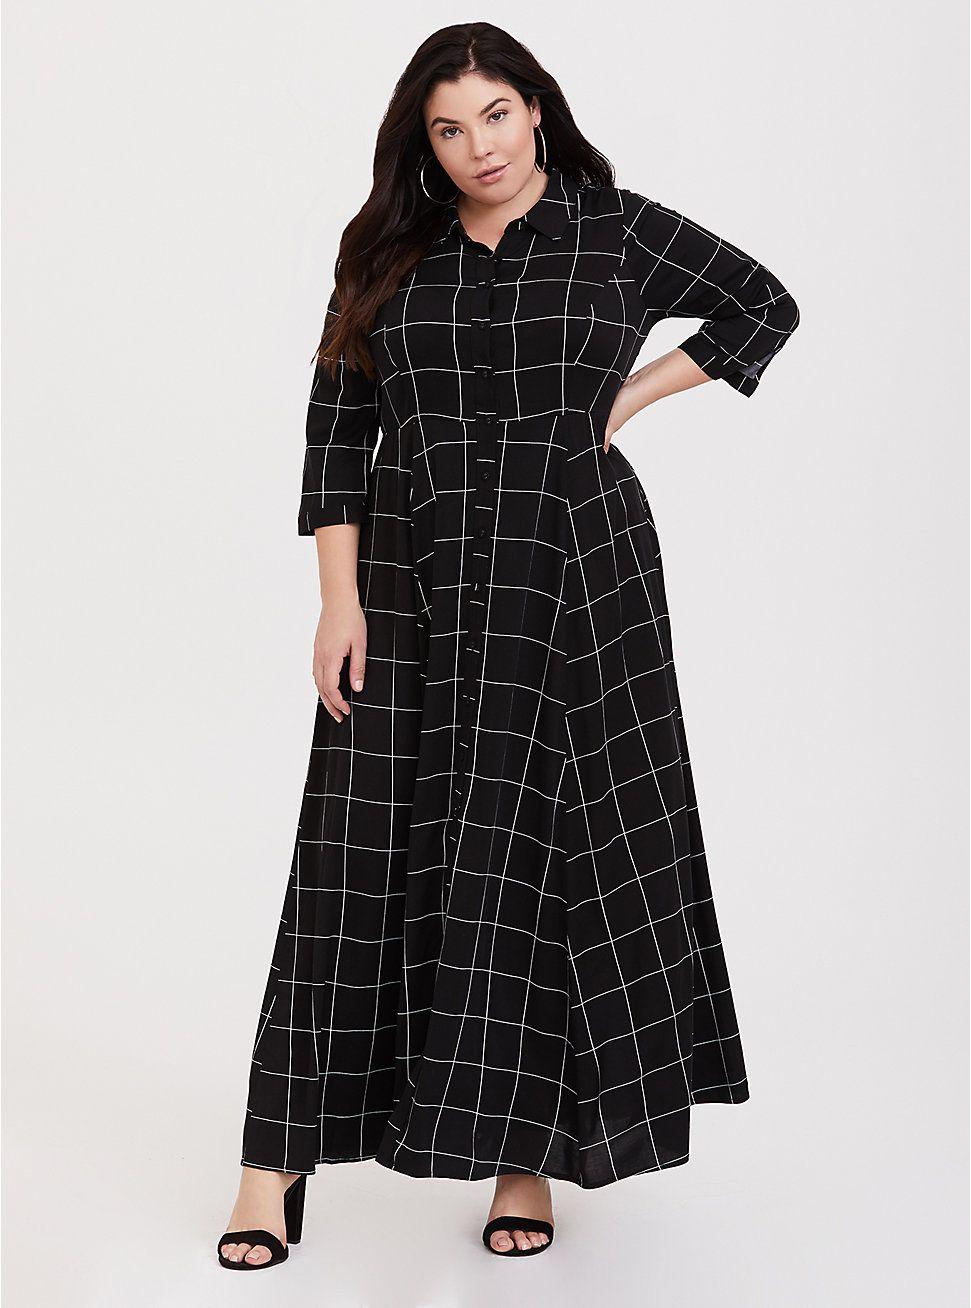 826ad567e2c7 Black Grid Challis Maxi Shirt Dress in 2019 | Dresses | Maxi shirt ...